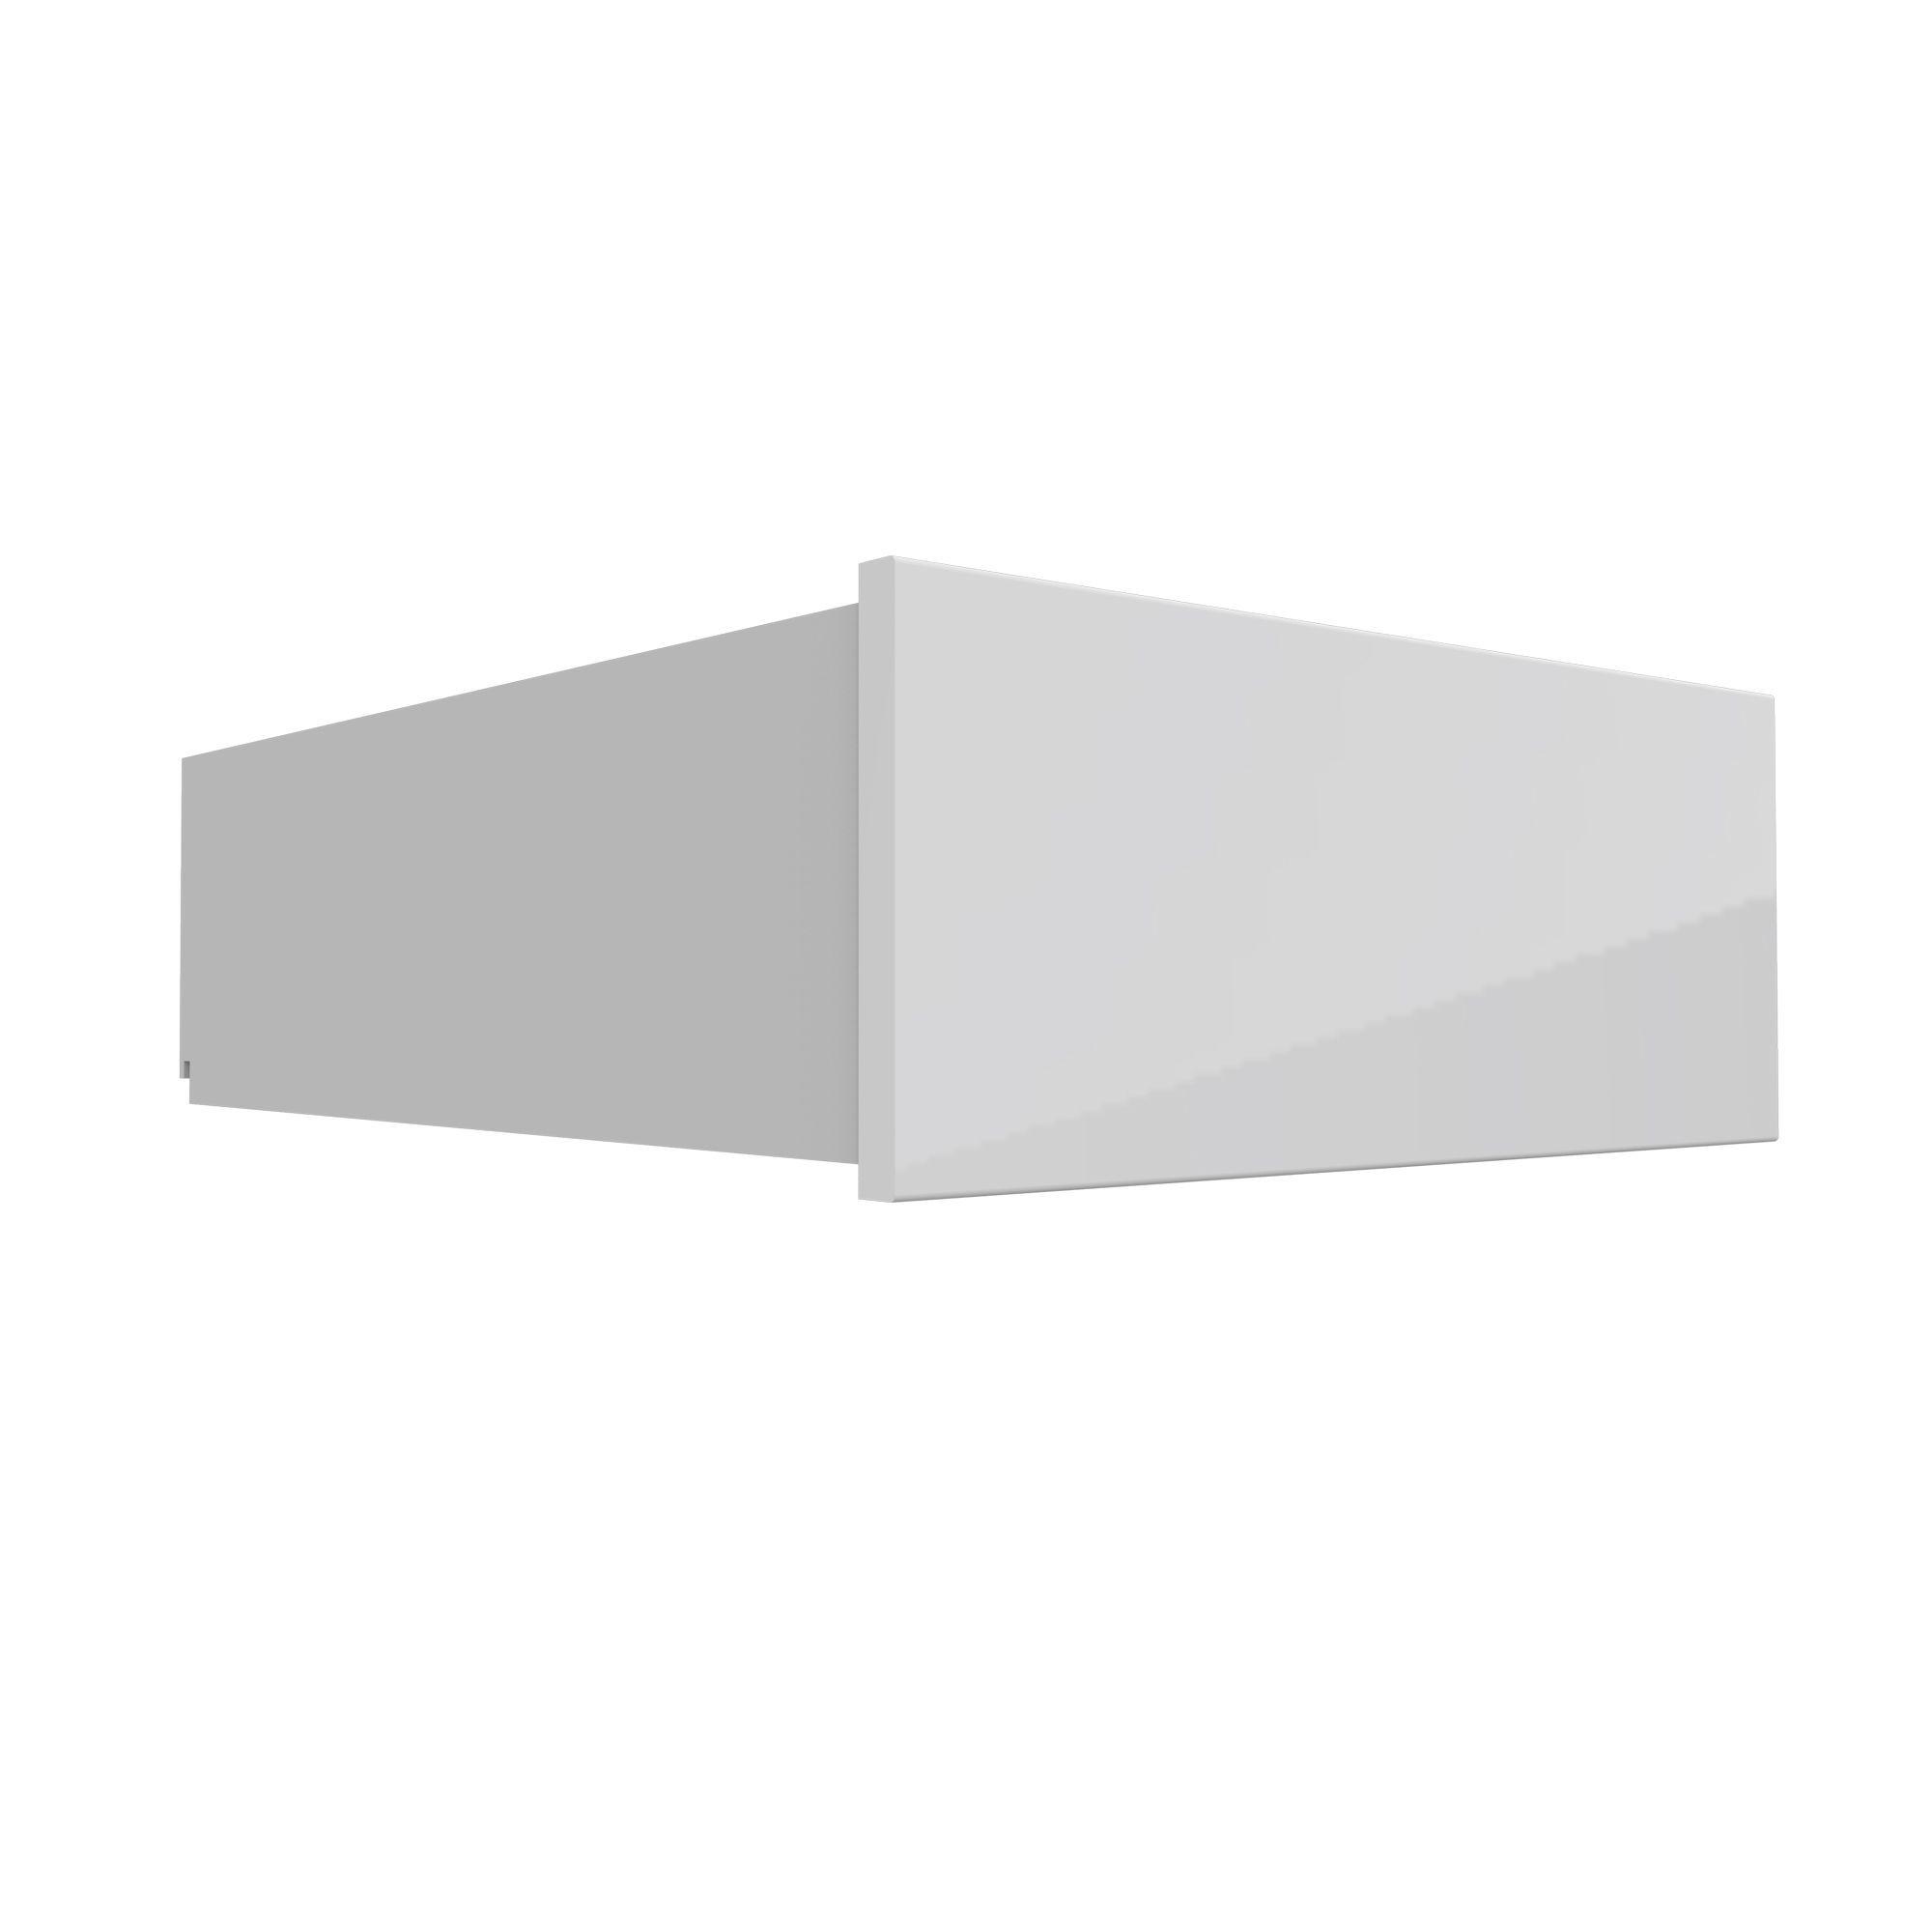 Darwin Modular White Internal Drawer (w) 500mm (d) 566mm